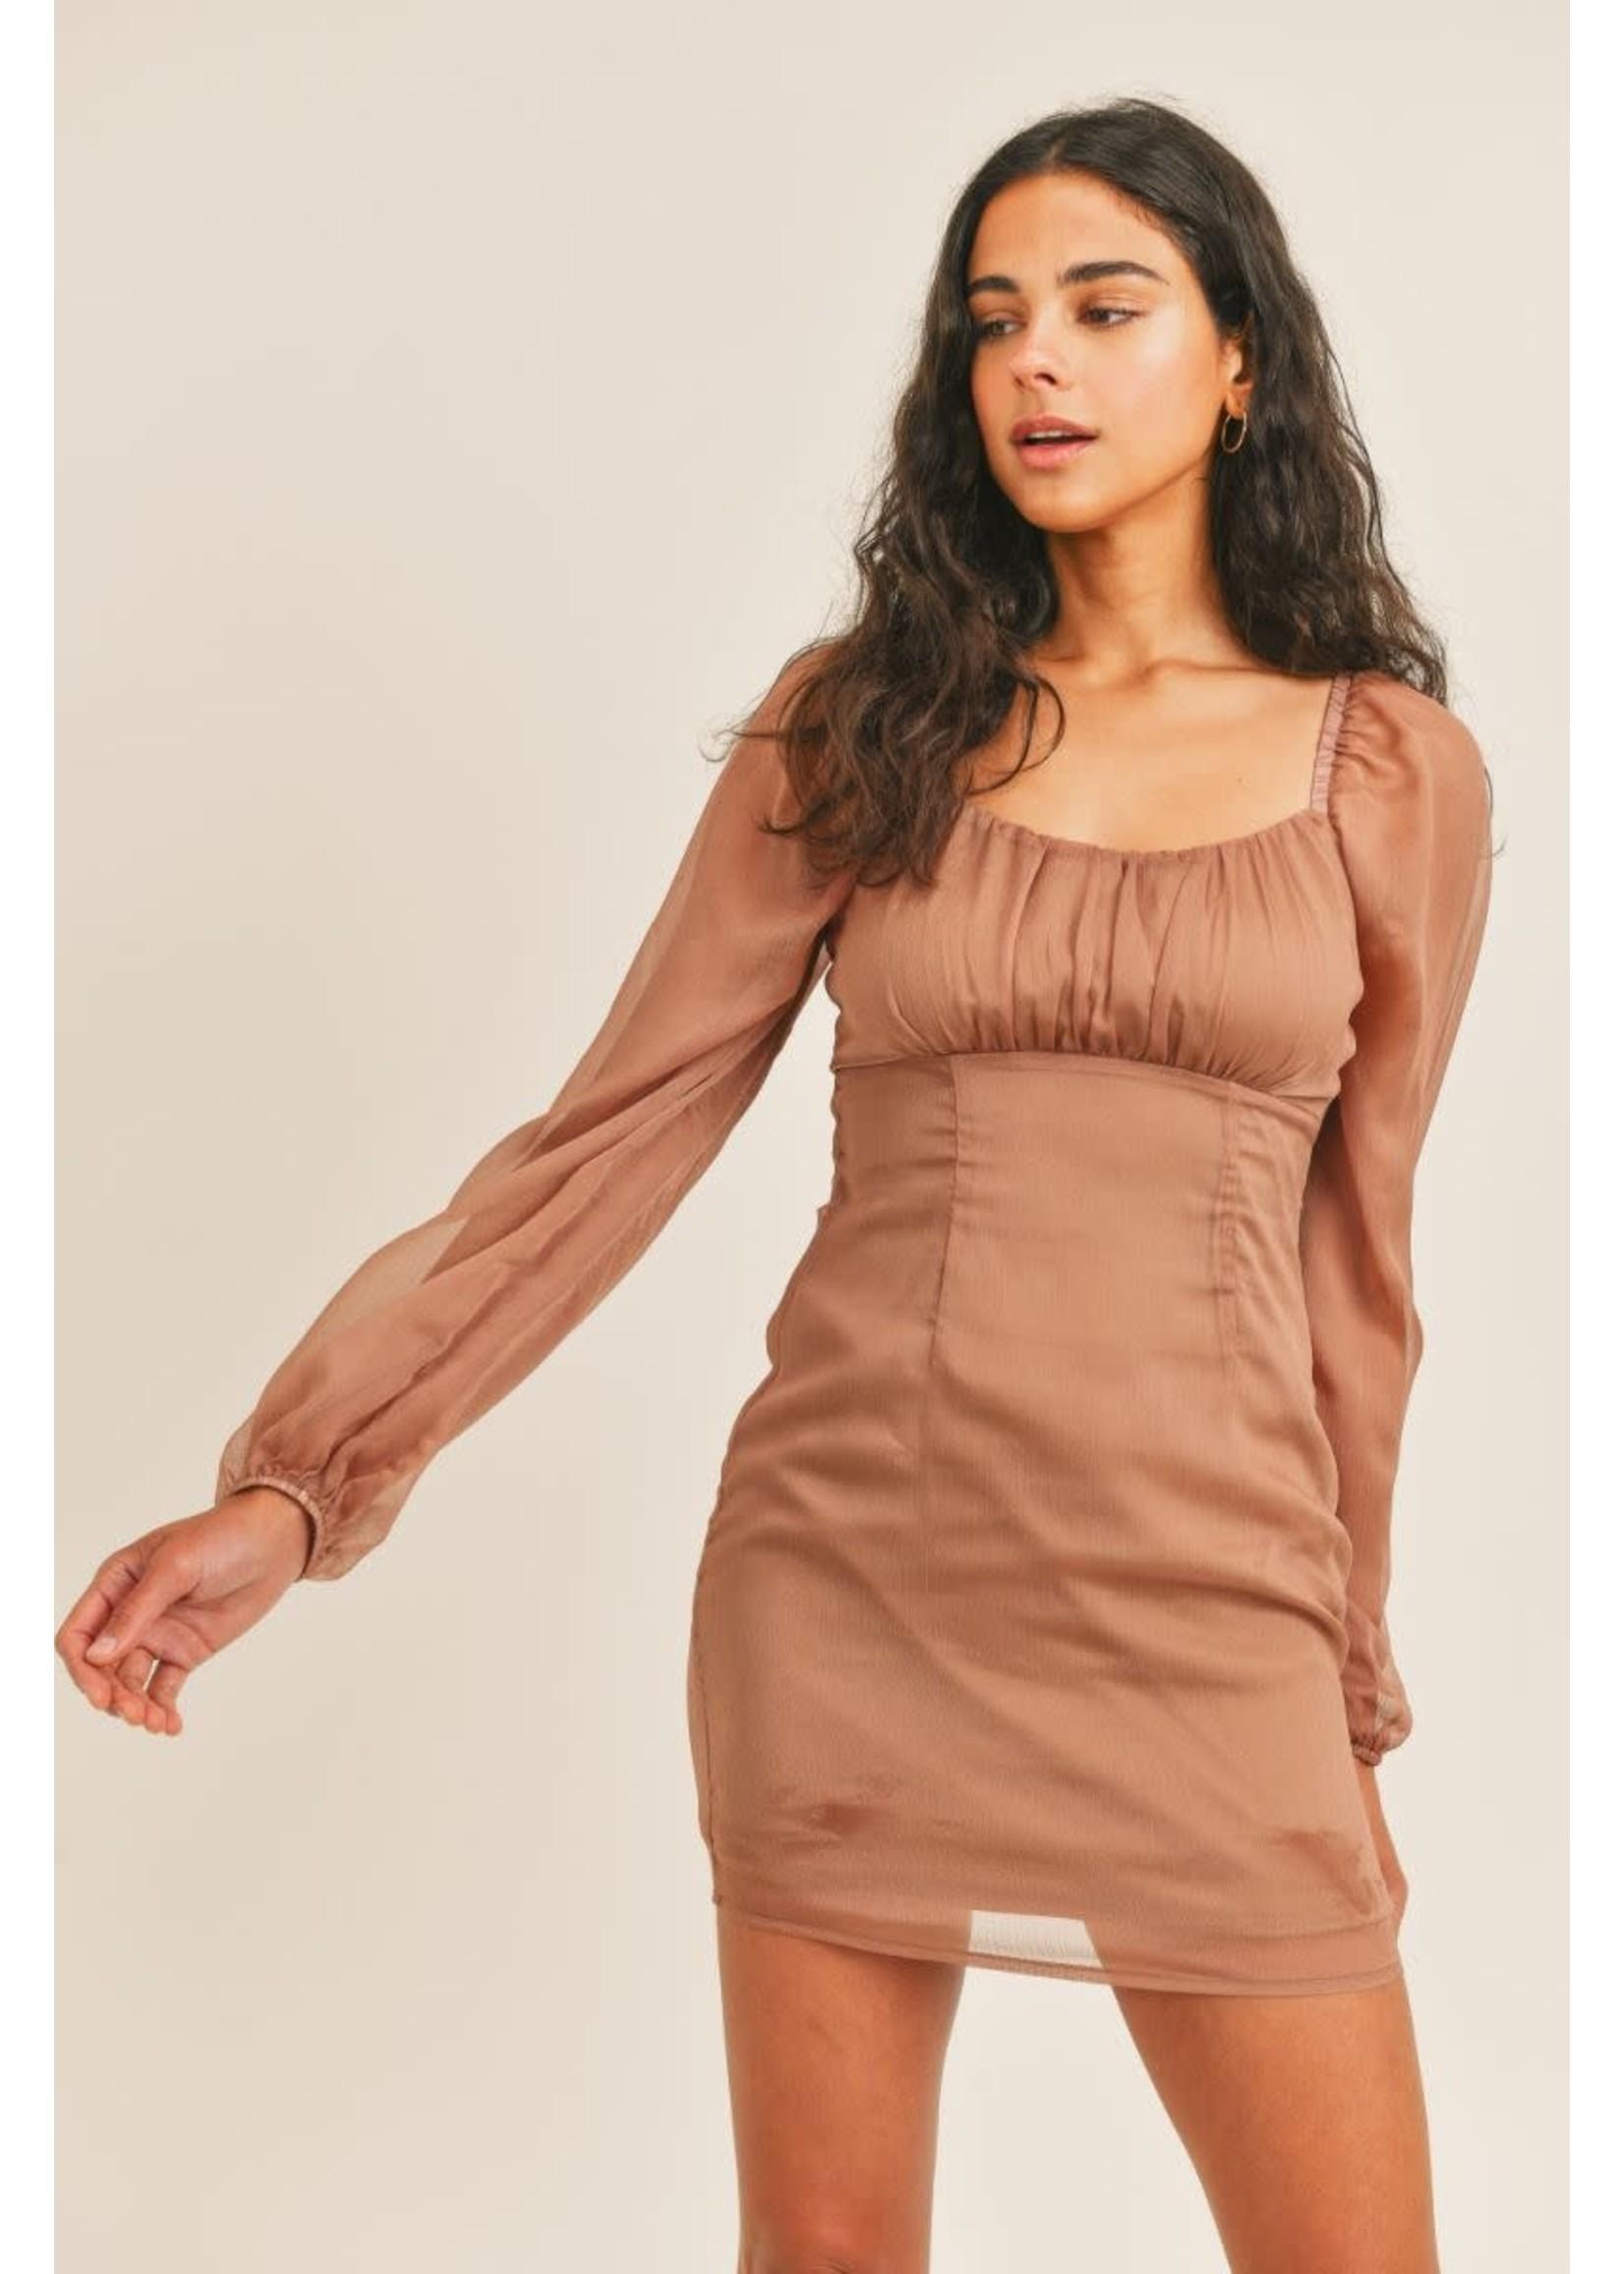 Sadie & Sage Think of You Smocked Mini Dress - AC331510